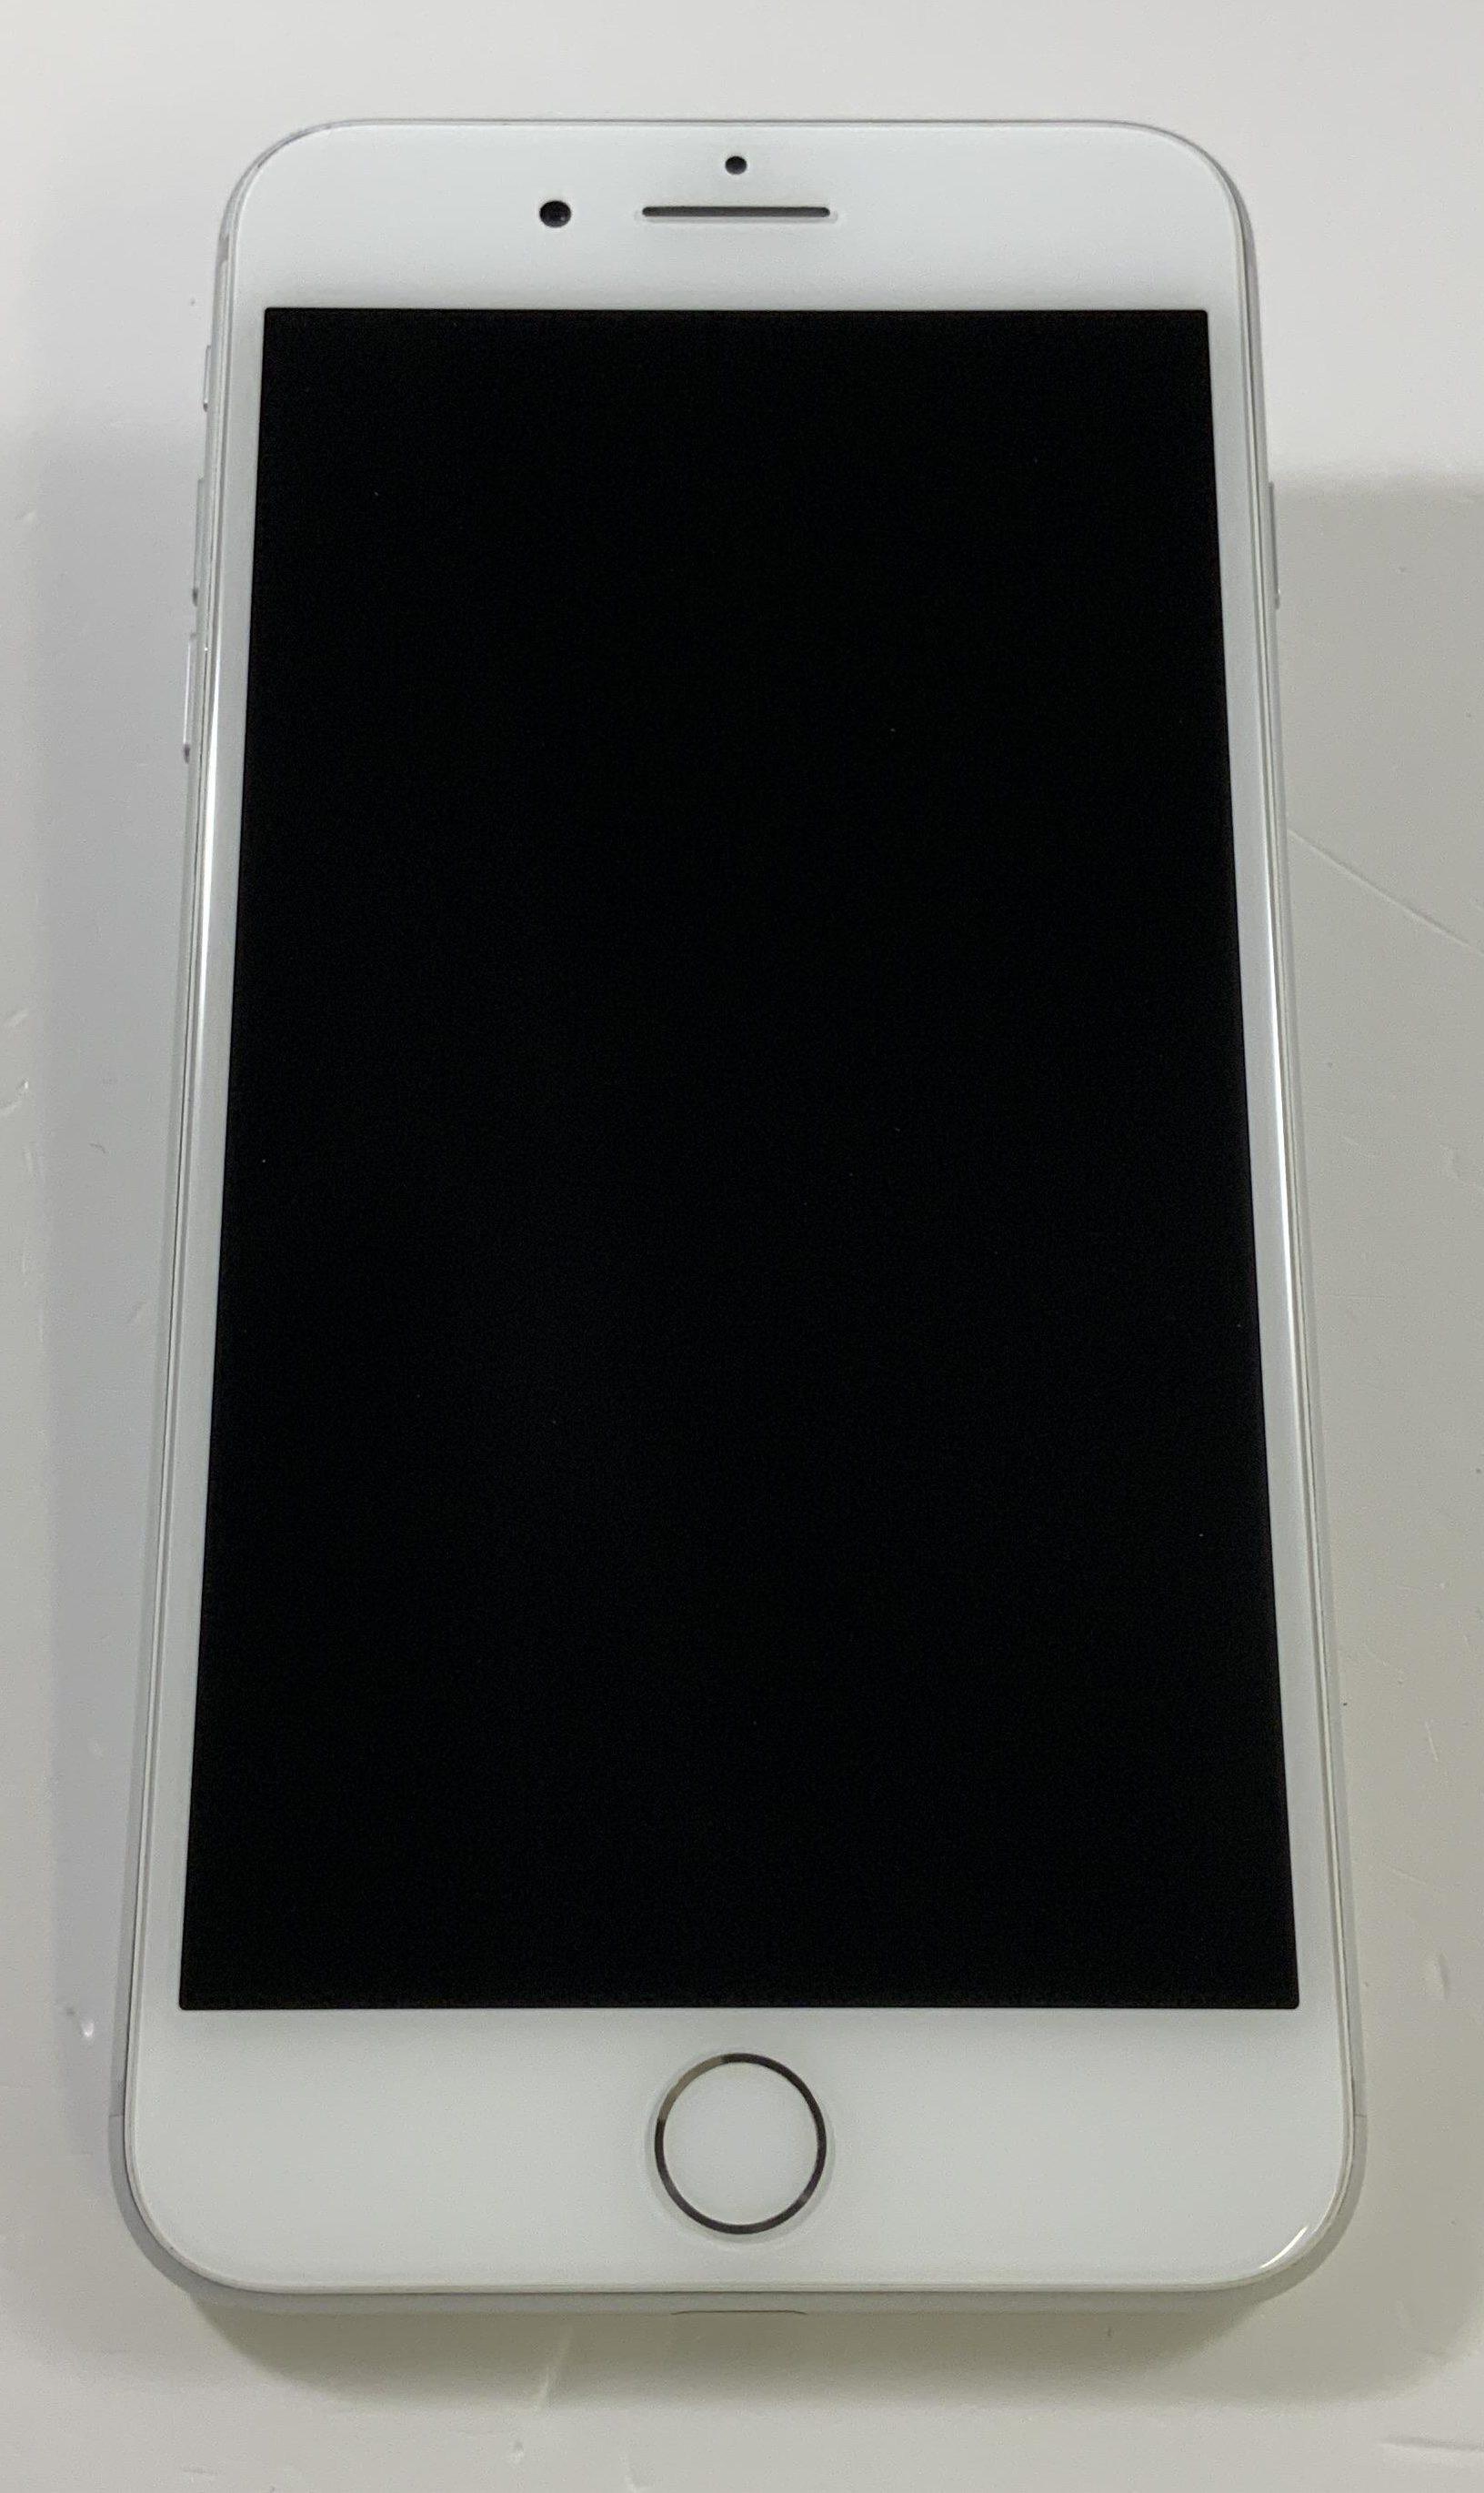 iPhone 8 Plus 64GB, 64GB, Silver, immagine 1